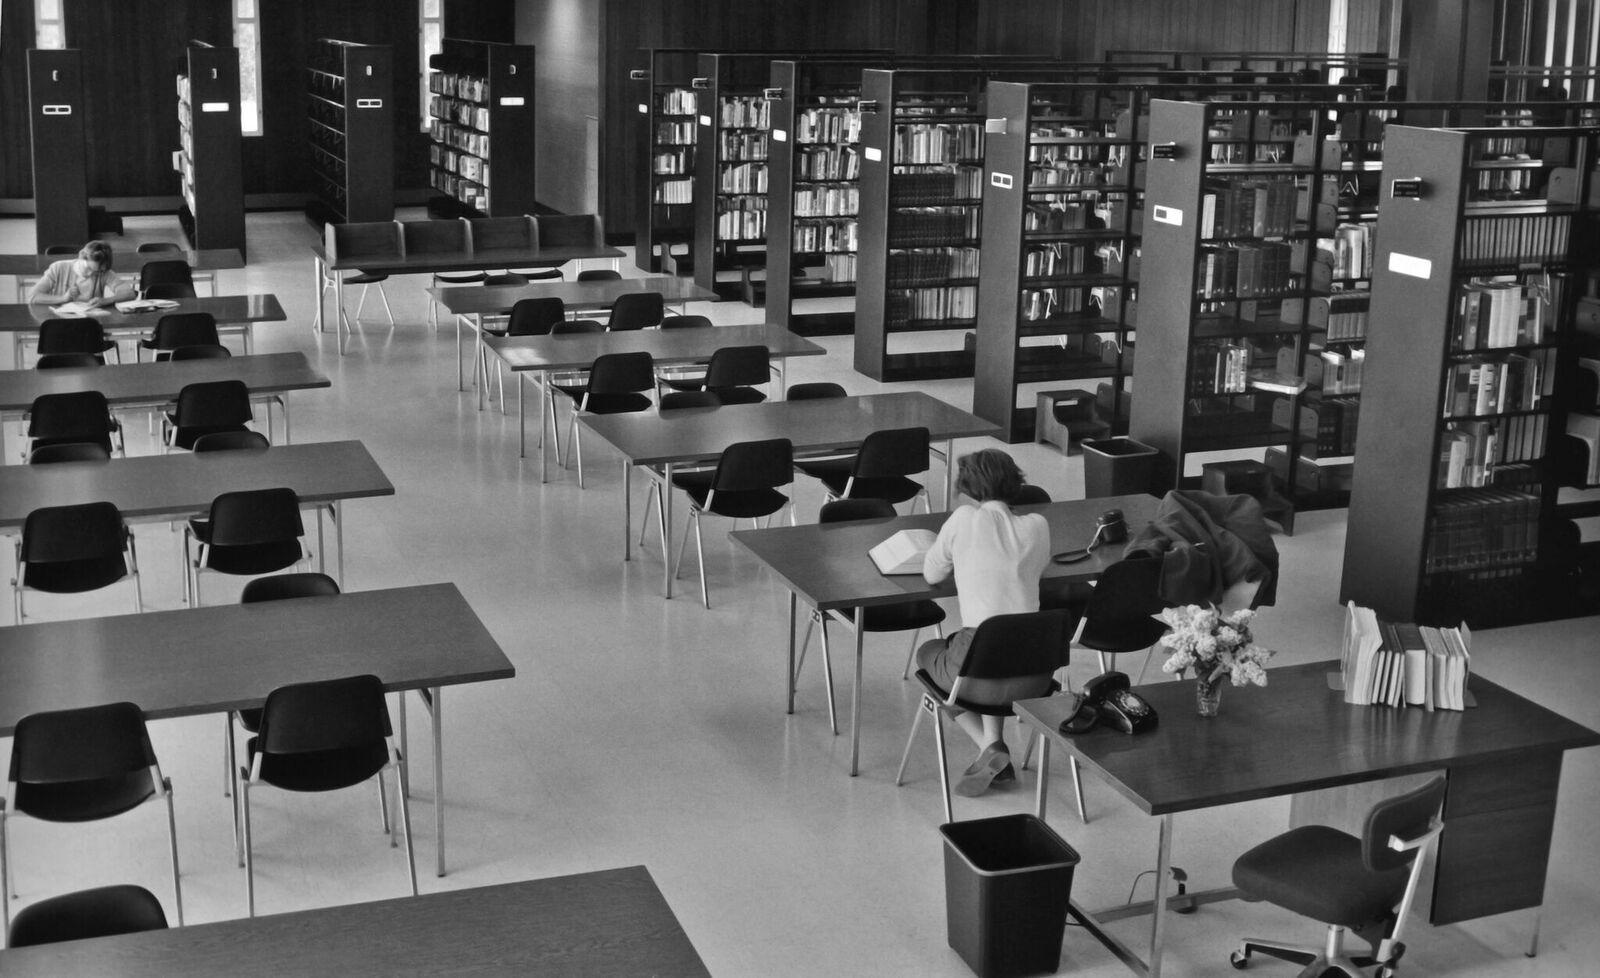 SouthPortland_Broadway_482_PublicLibary_1960s_Research_CHRISTOPHER_GRASSE.jpg